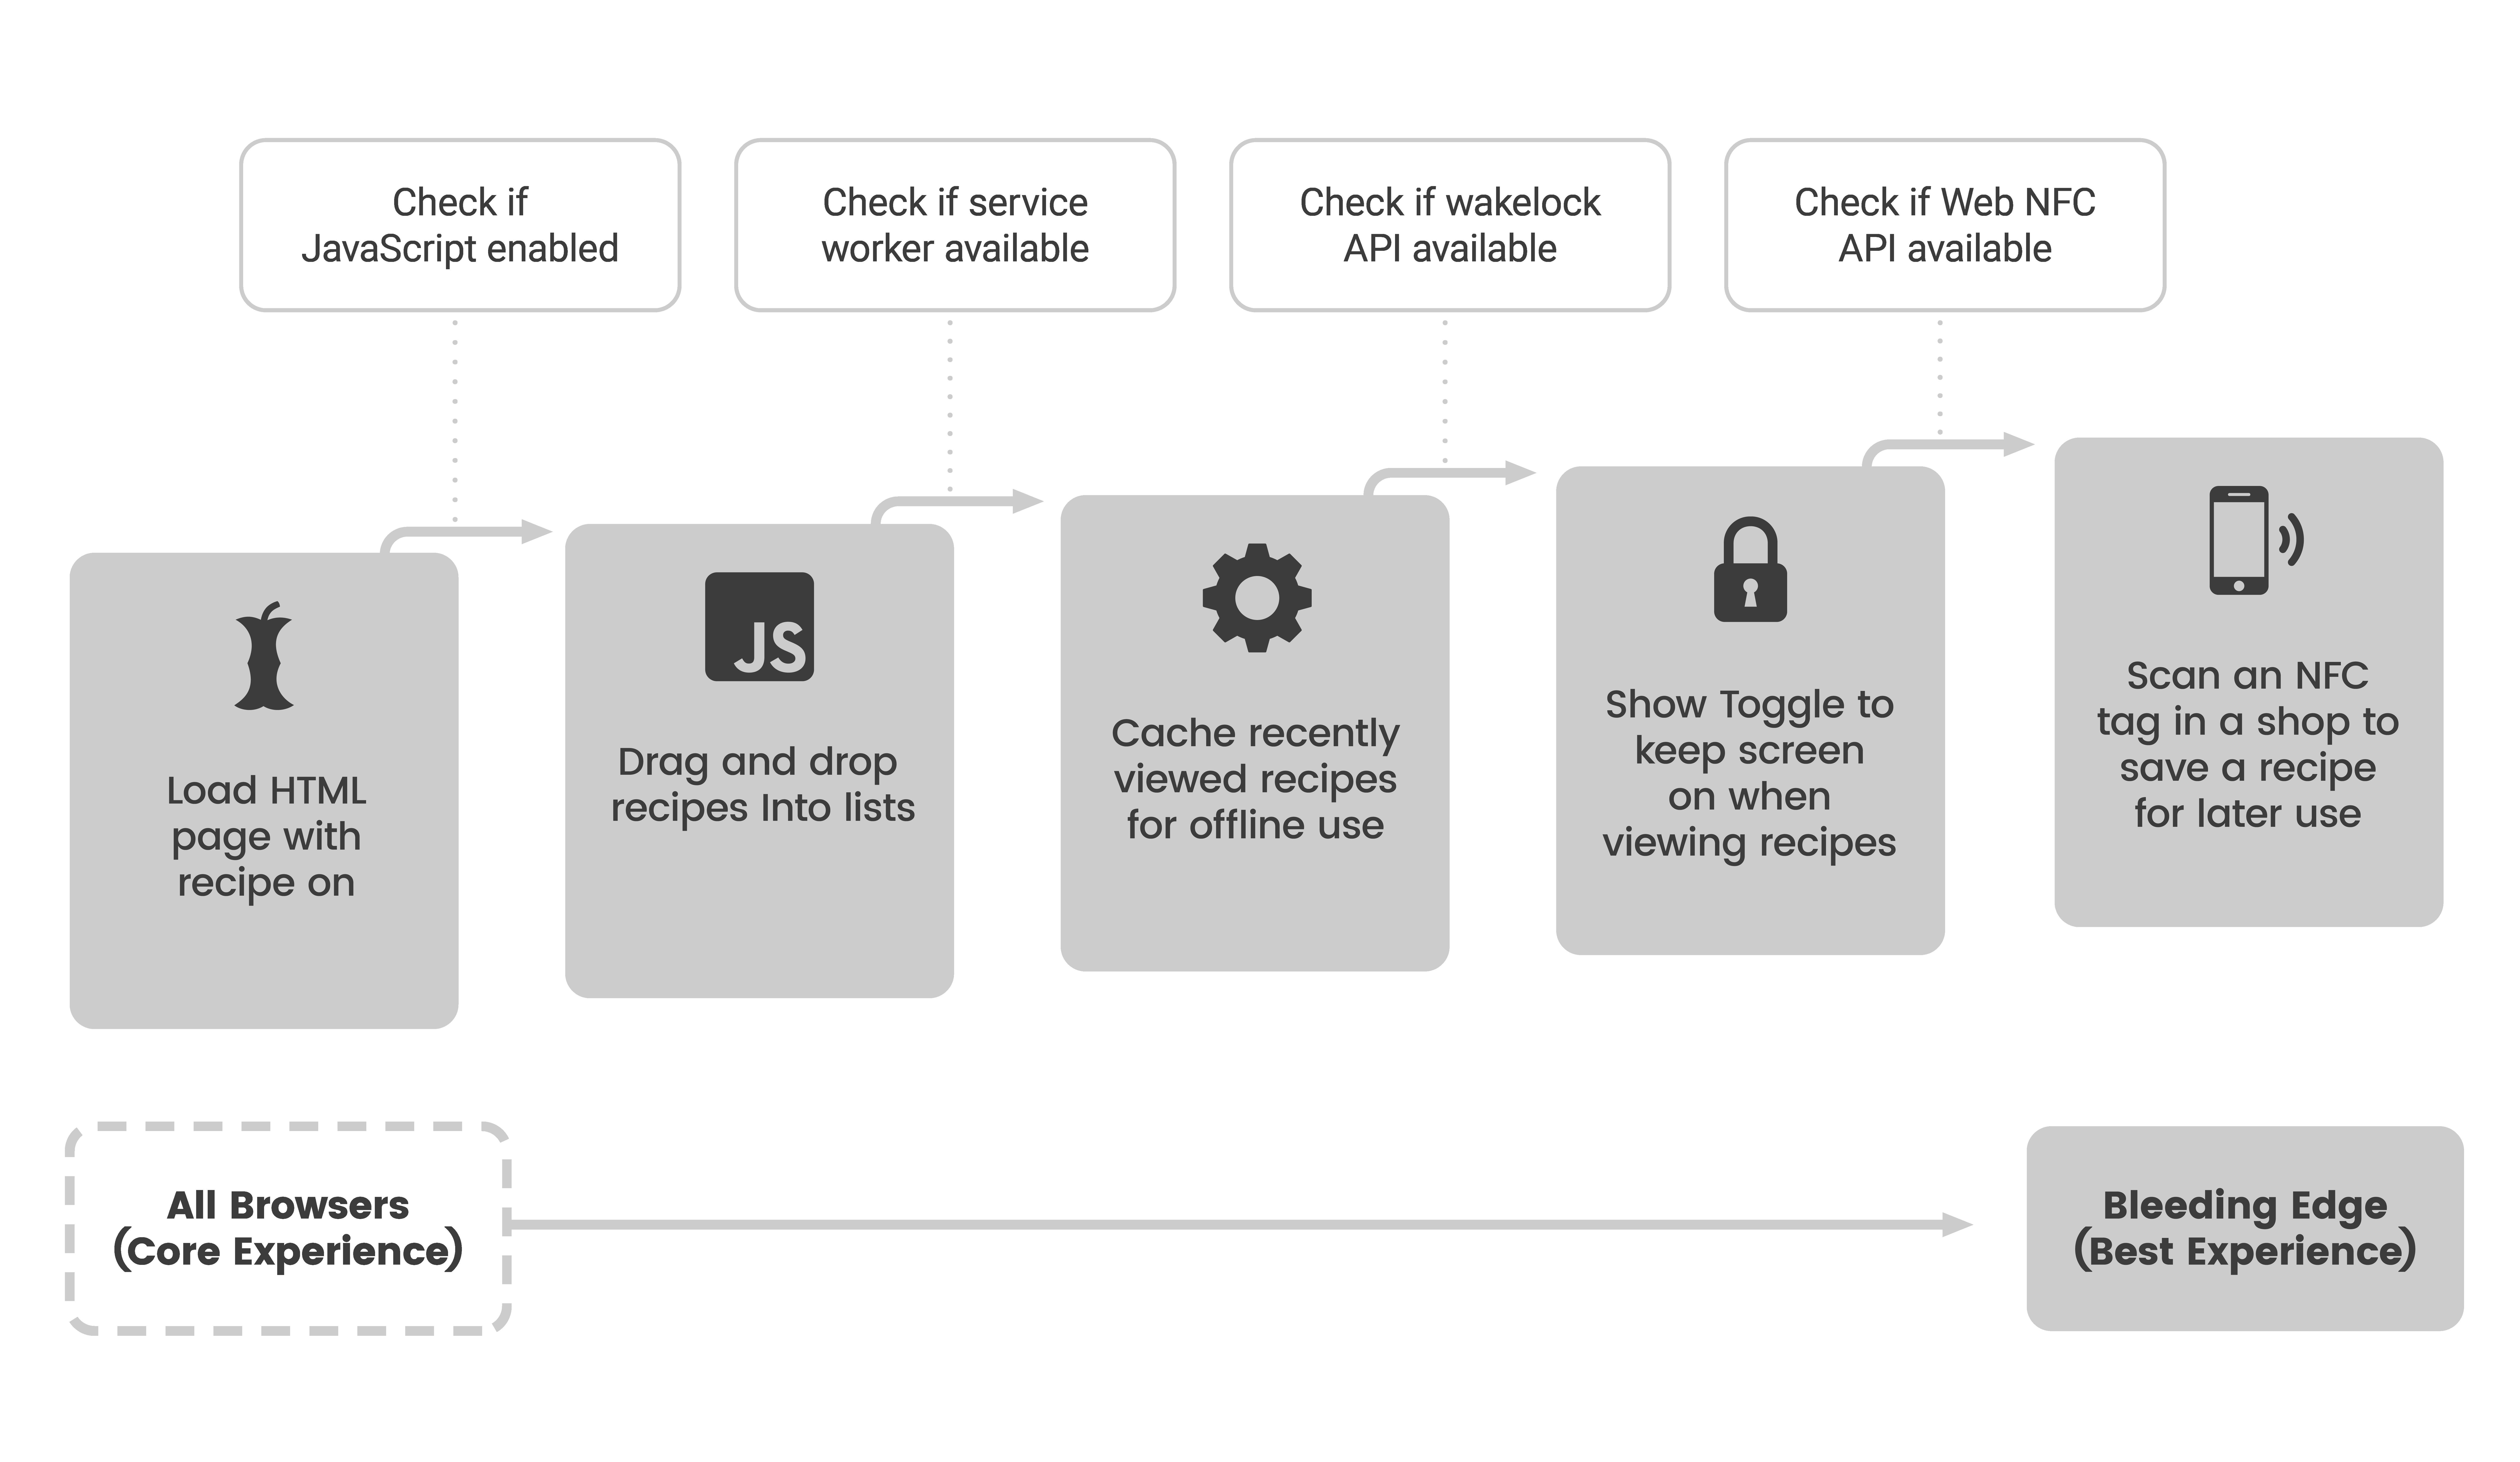 https://f.hubspotusercontent40.net/hubfs/14563840/Imported_Blog_Media/pwa_blog_-_in_text_diagram-12.png